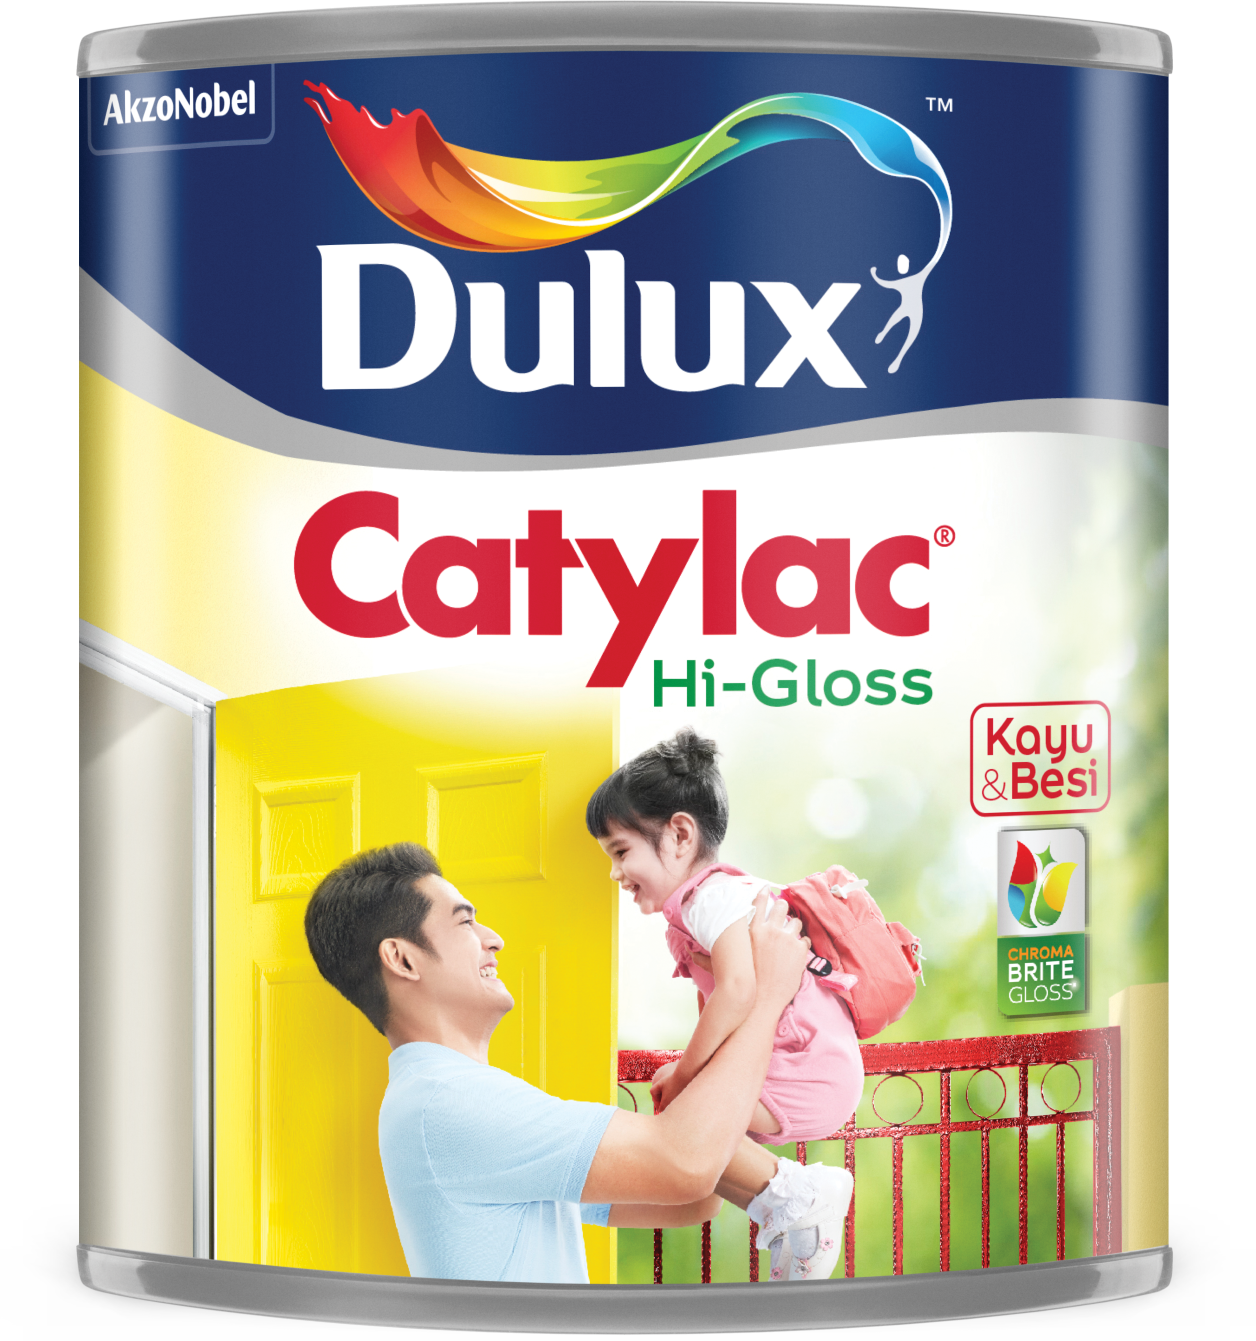 Dulux Catylac Hi-Gloss